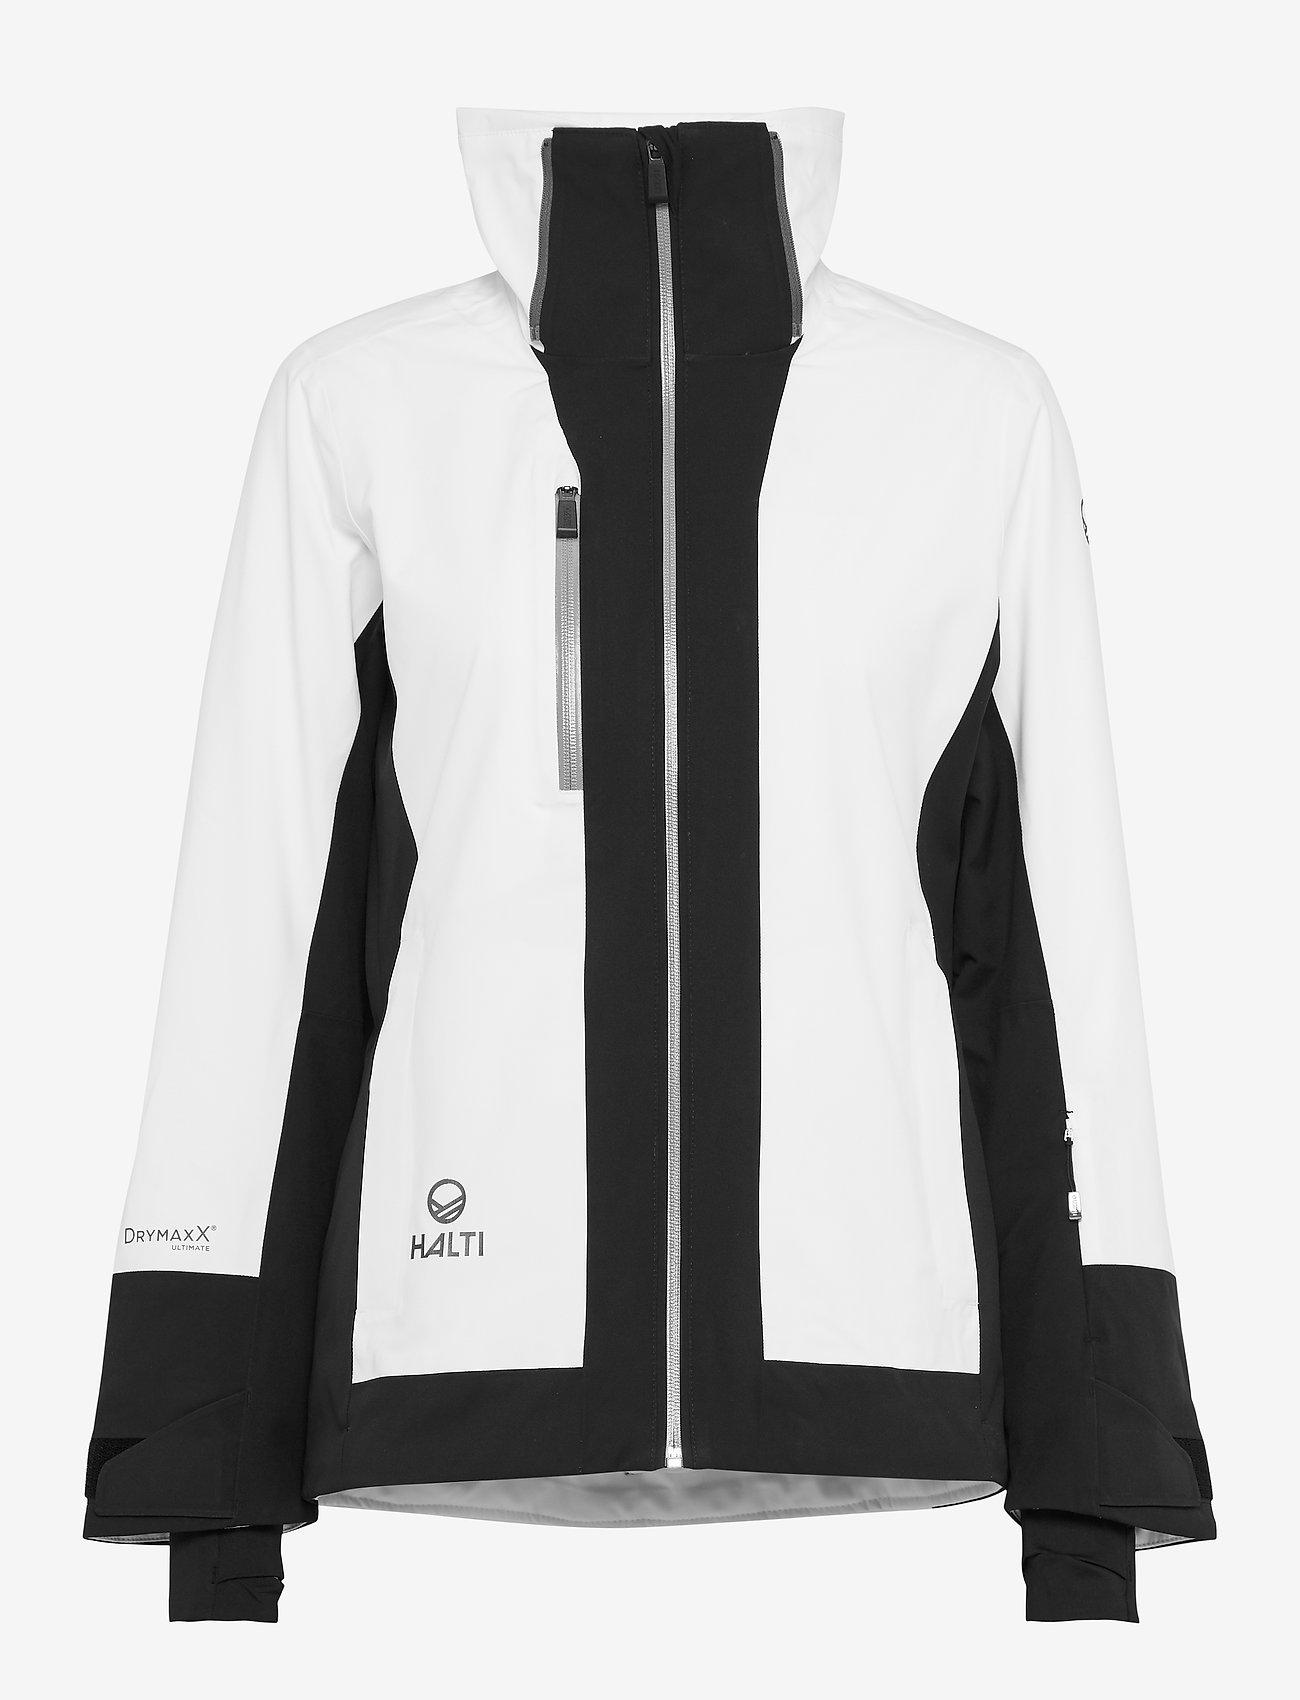 Podium Ii W Jacket (White) (314.30 €) - Halti hapdo